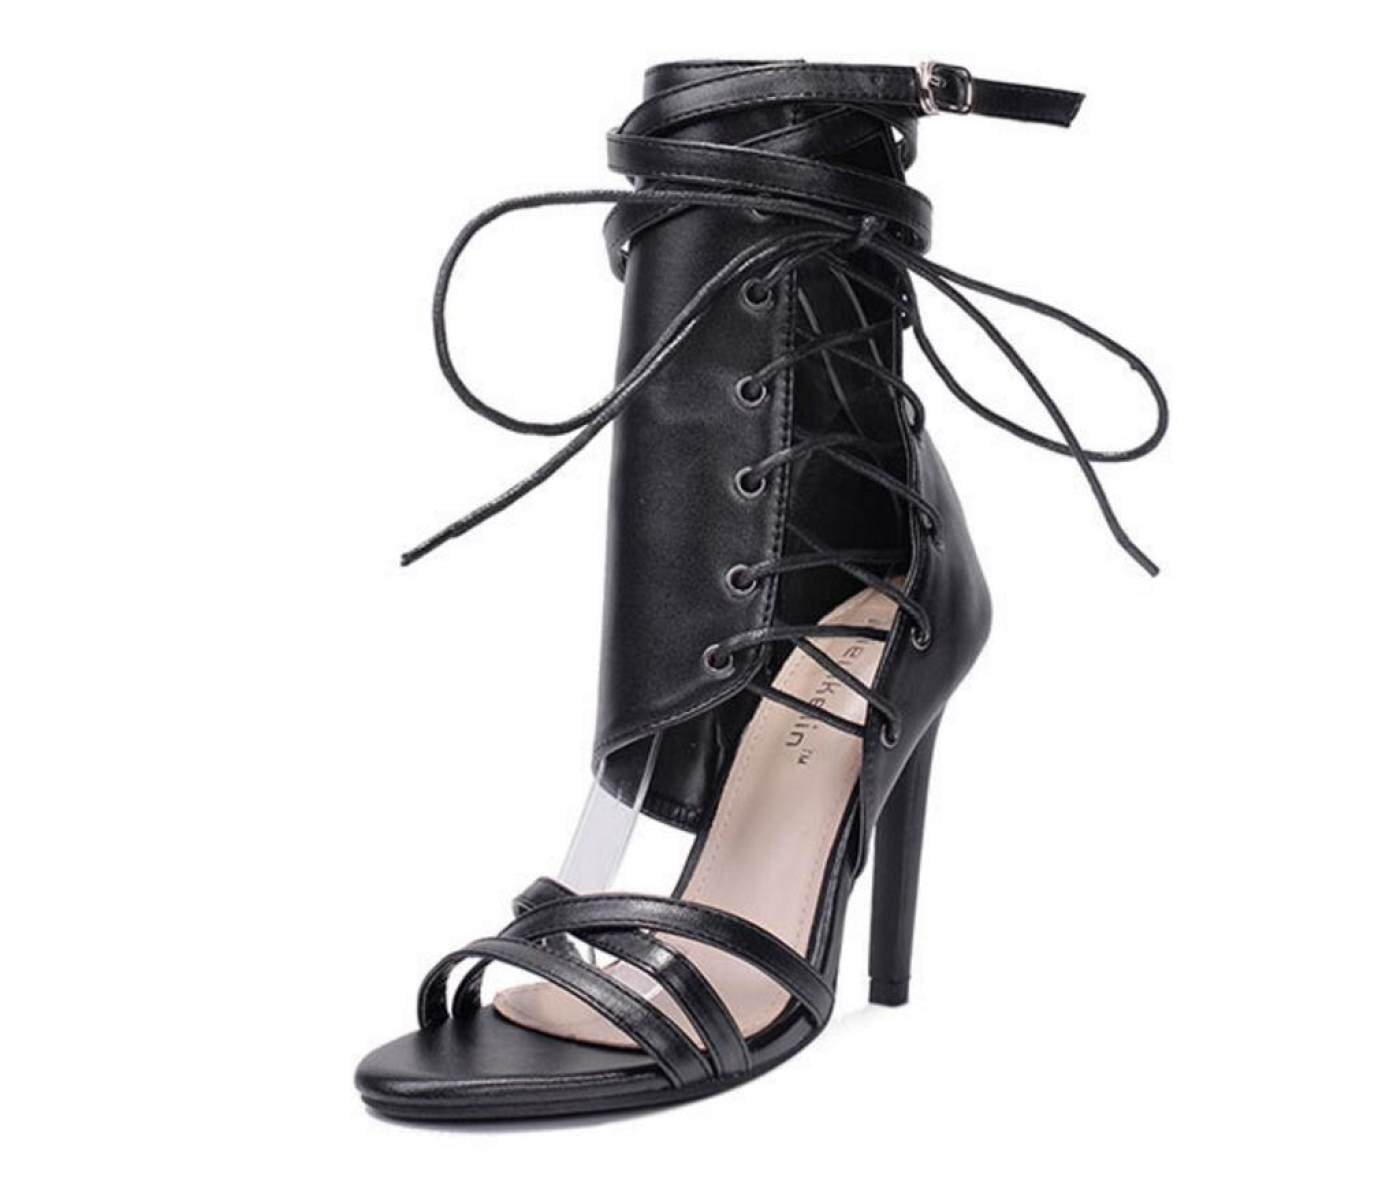 NBWE Sexy Riemengürtelschnalle High 12cm Heels Römermode Sandalen 12cm High schwarz 9f25b6